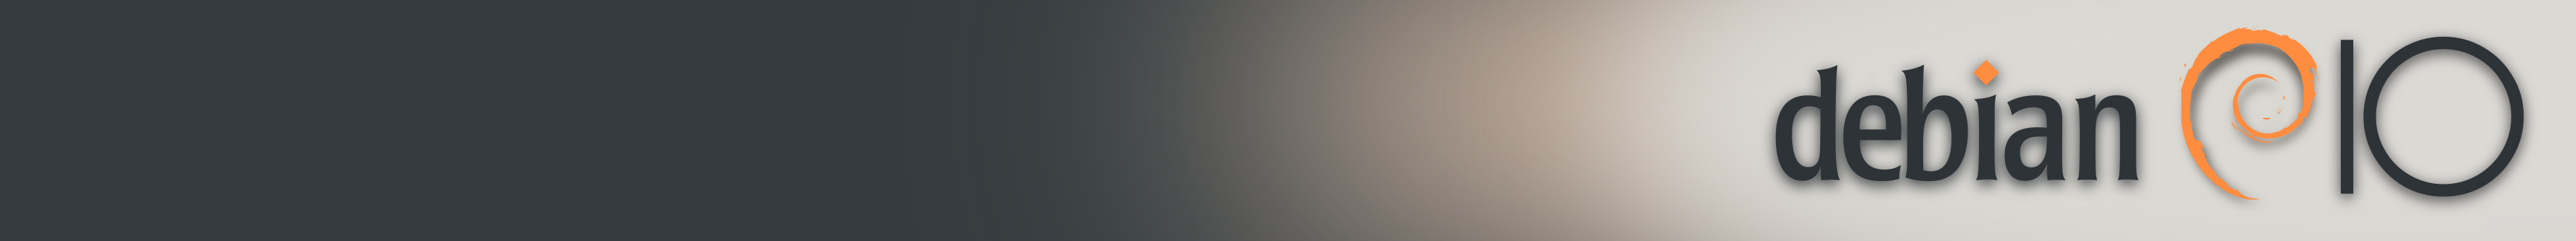 png/800x75-banner-installer-2.png